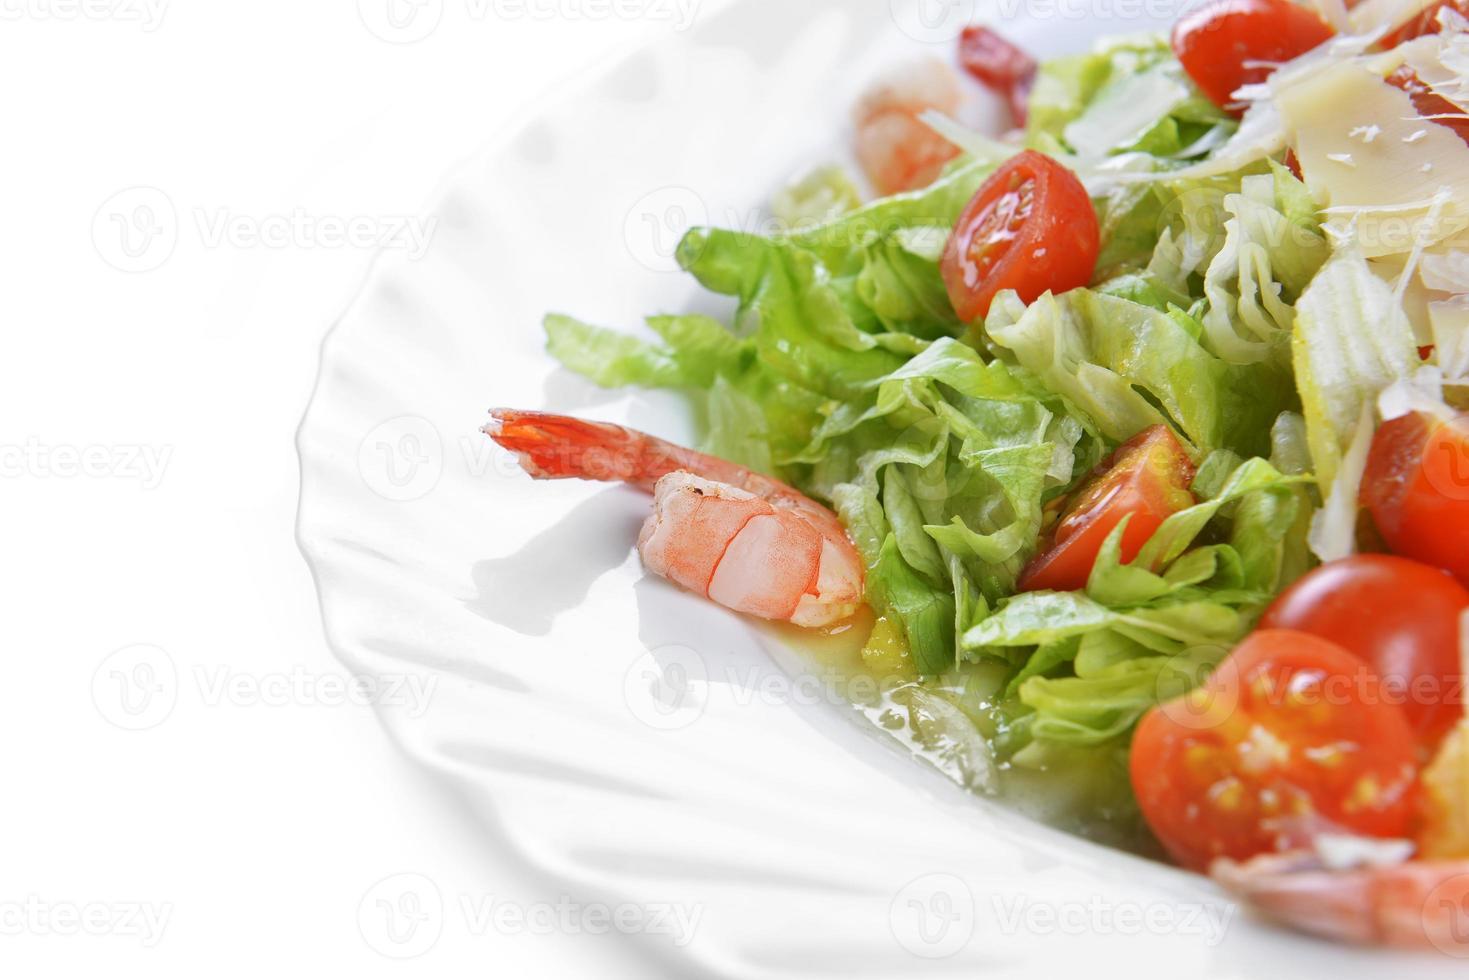 Salat mit Meeresfrüchten foto